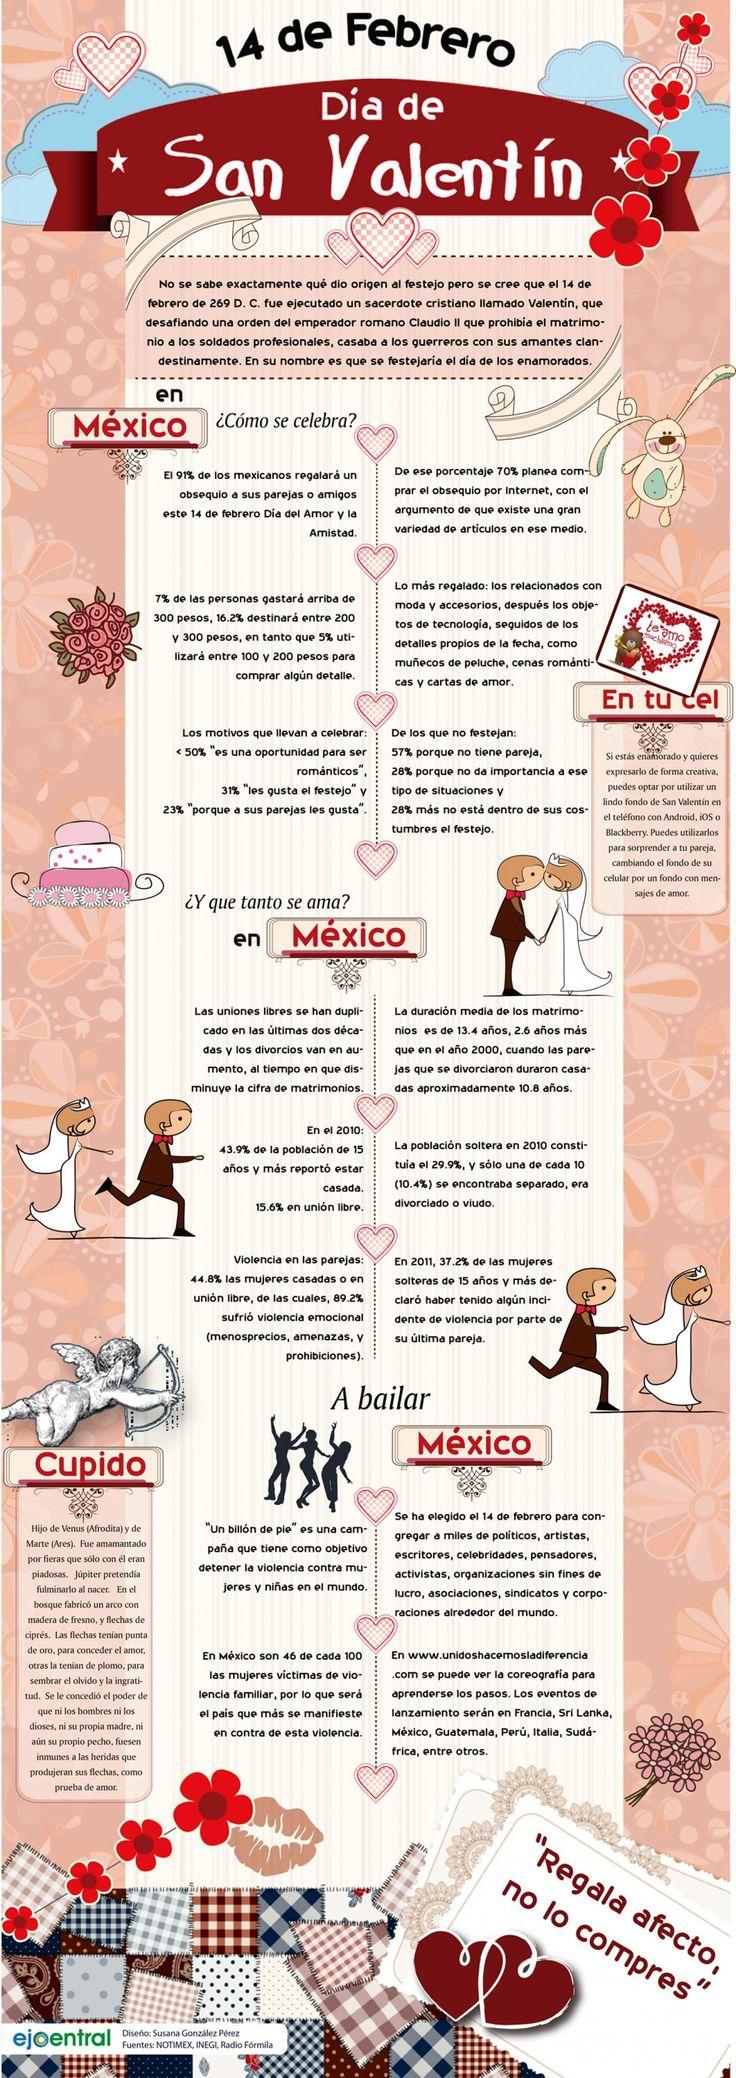 México celebra san valentin Infographic